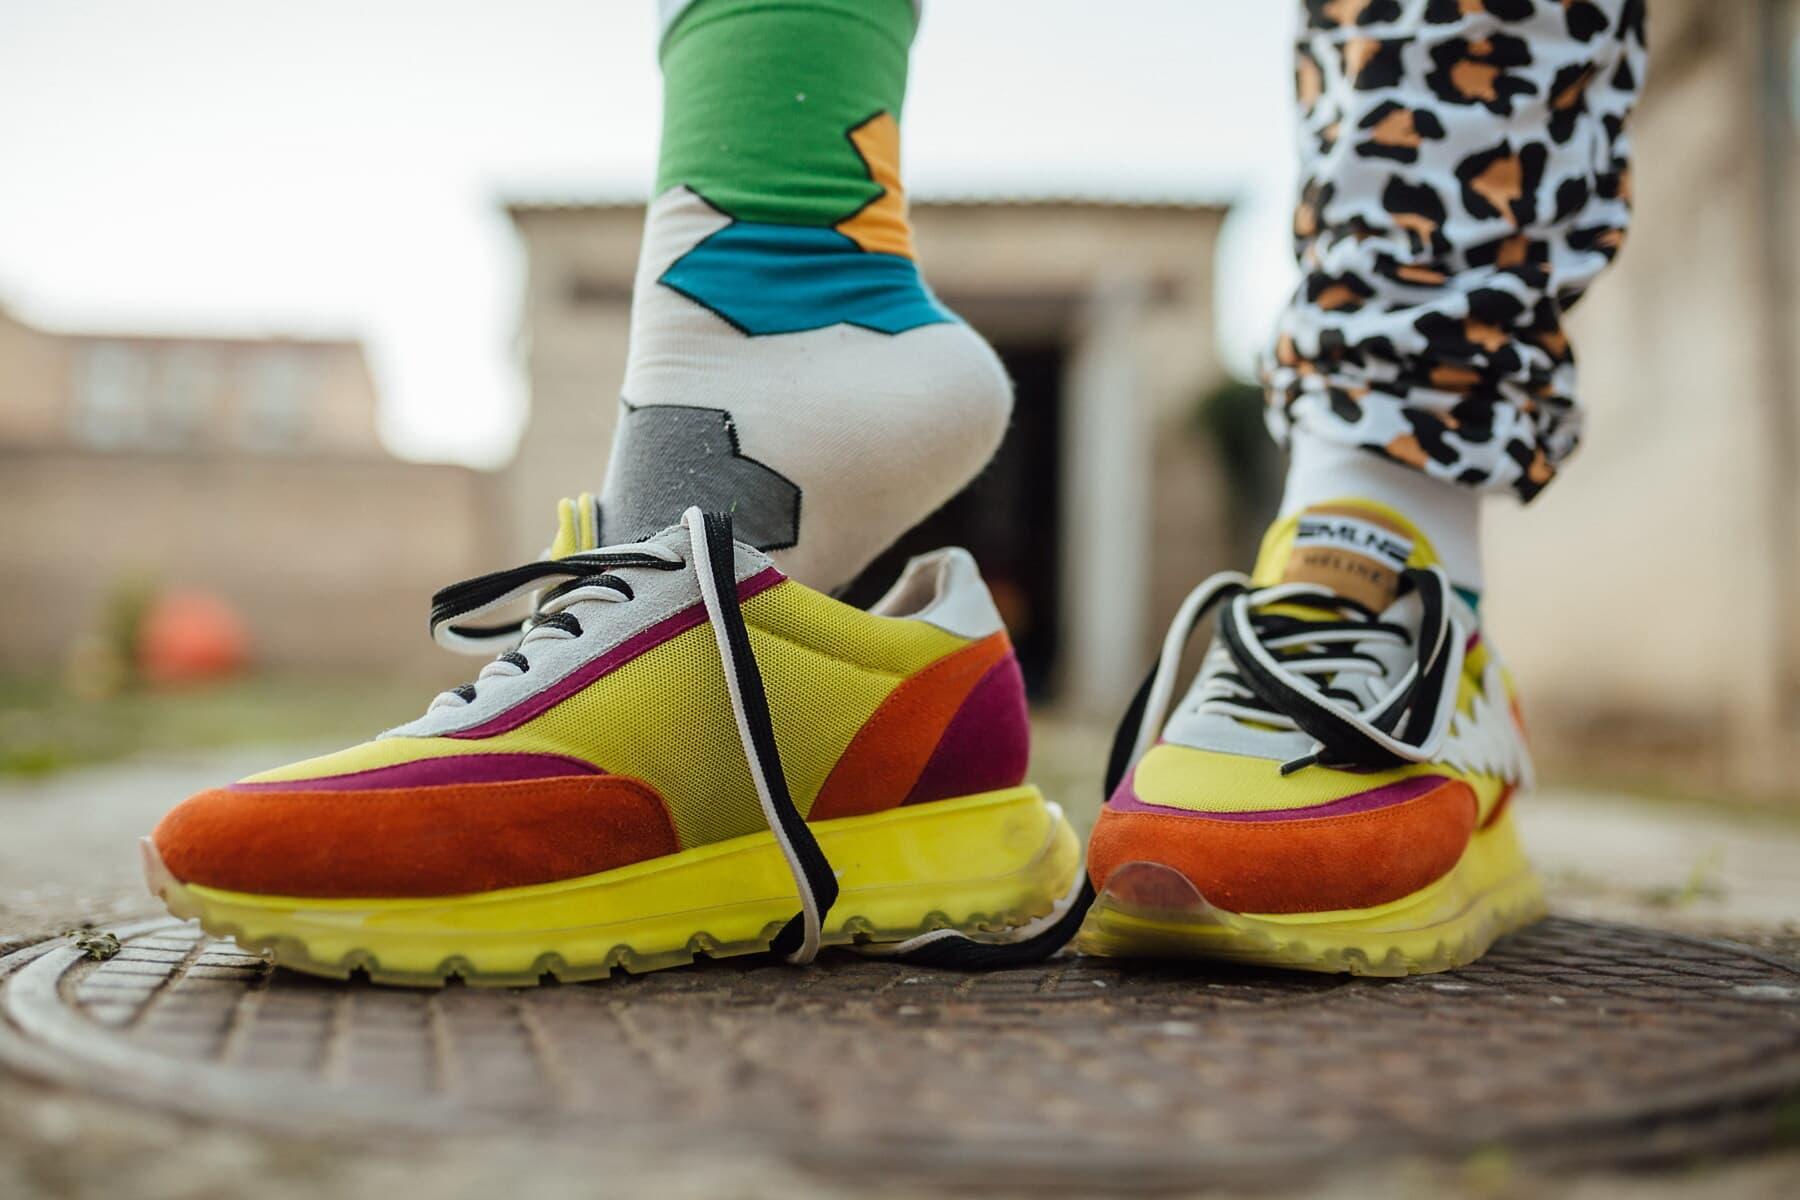 bunte, Turnschuhe, Beine, Socken, freier Stil, Mode, Kleidung, Schuhe, Fuß, paar